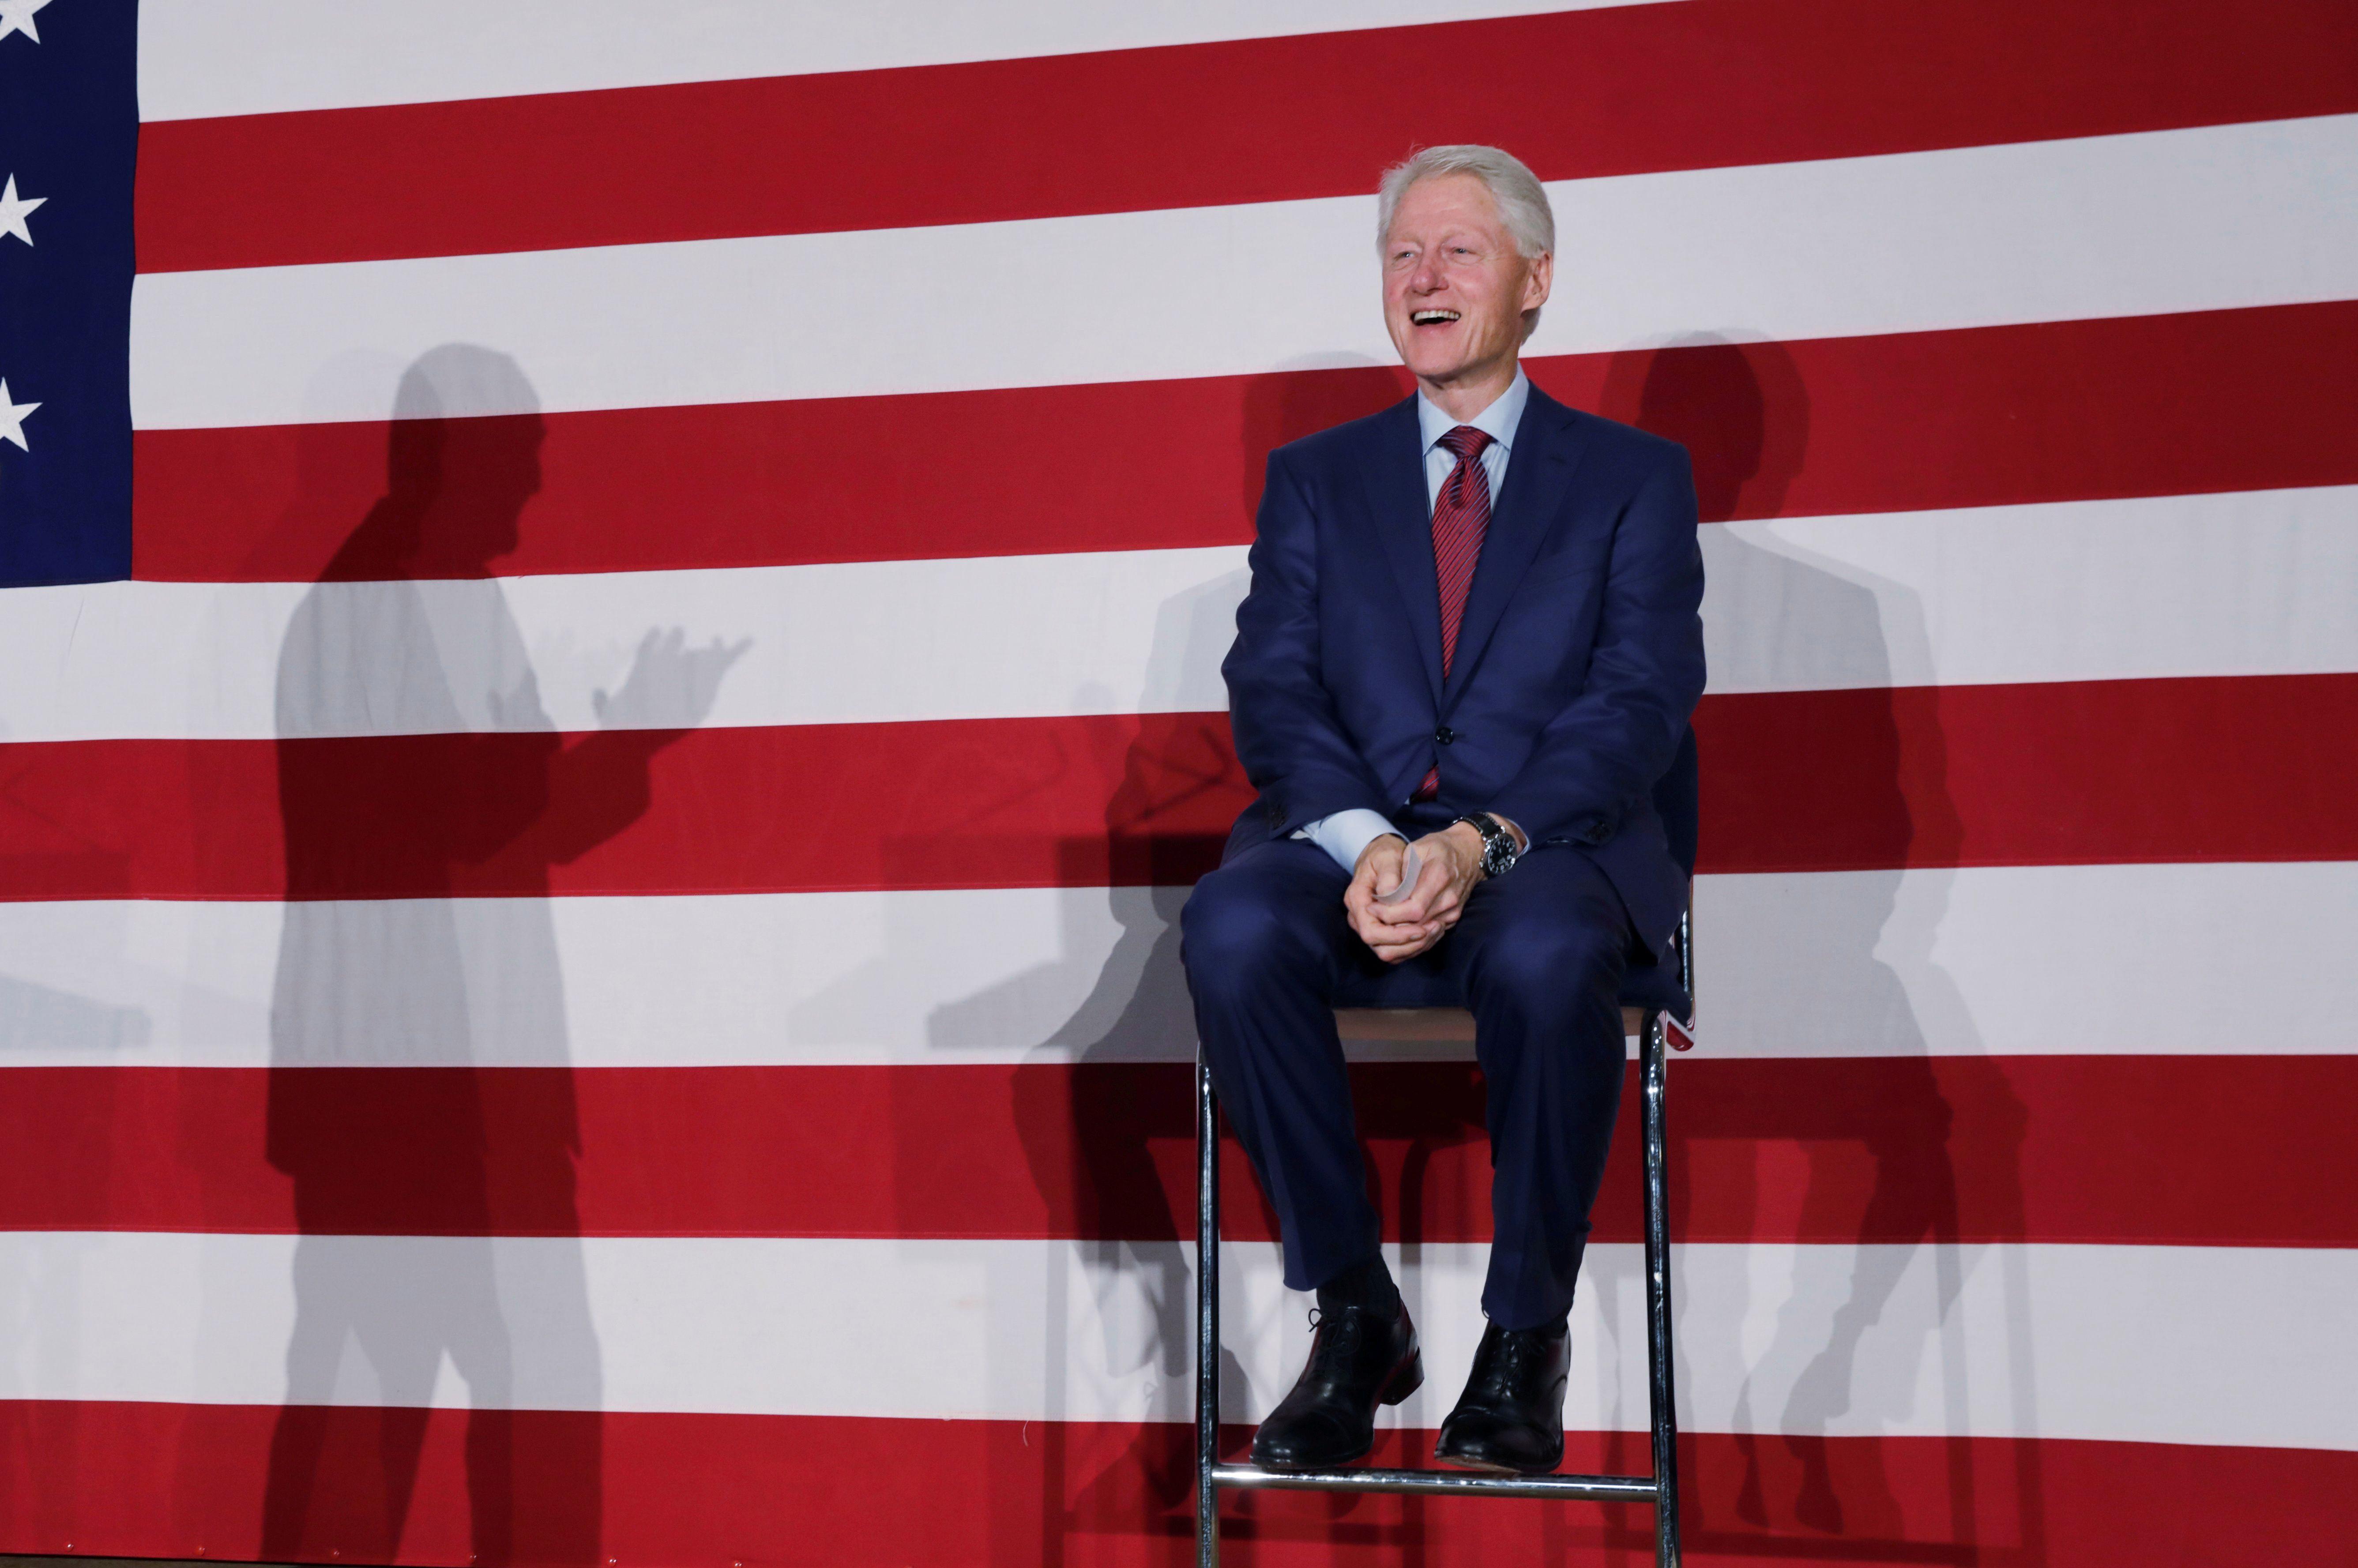 In the inspector general's report, Bill Clinton and Loretta